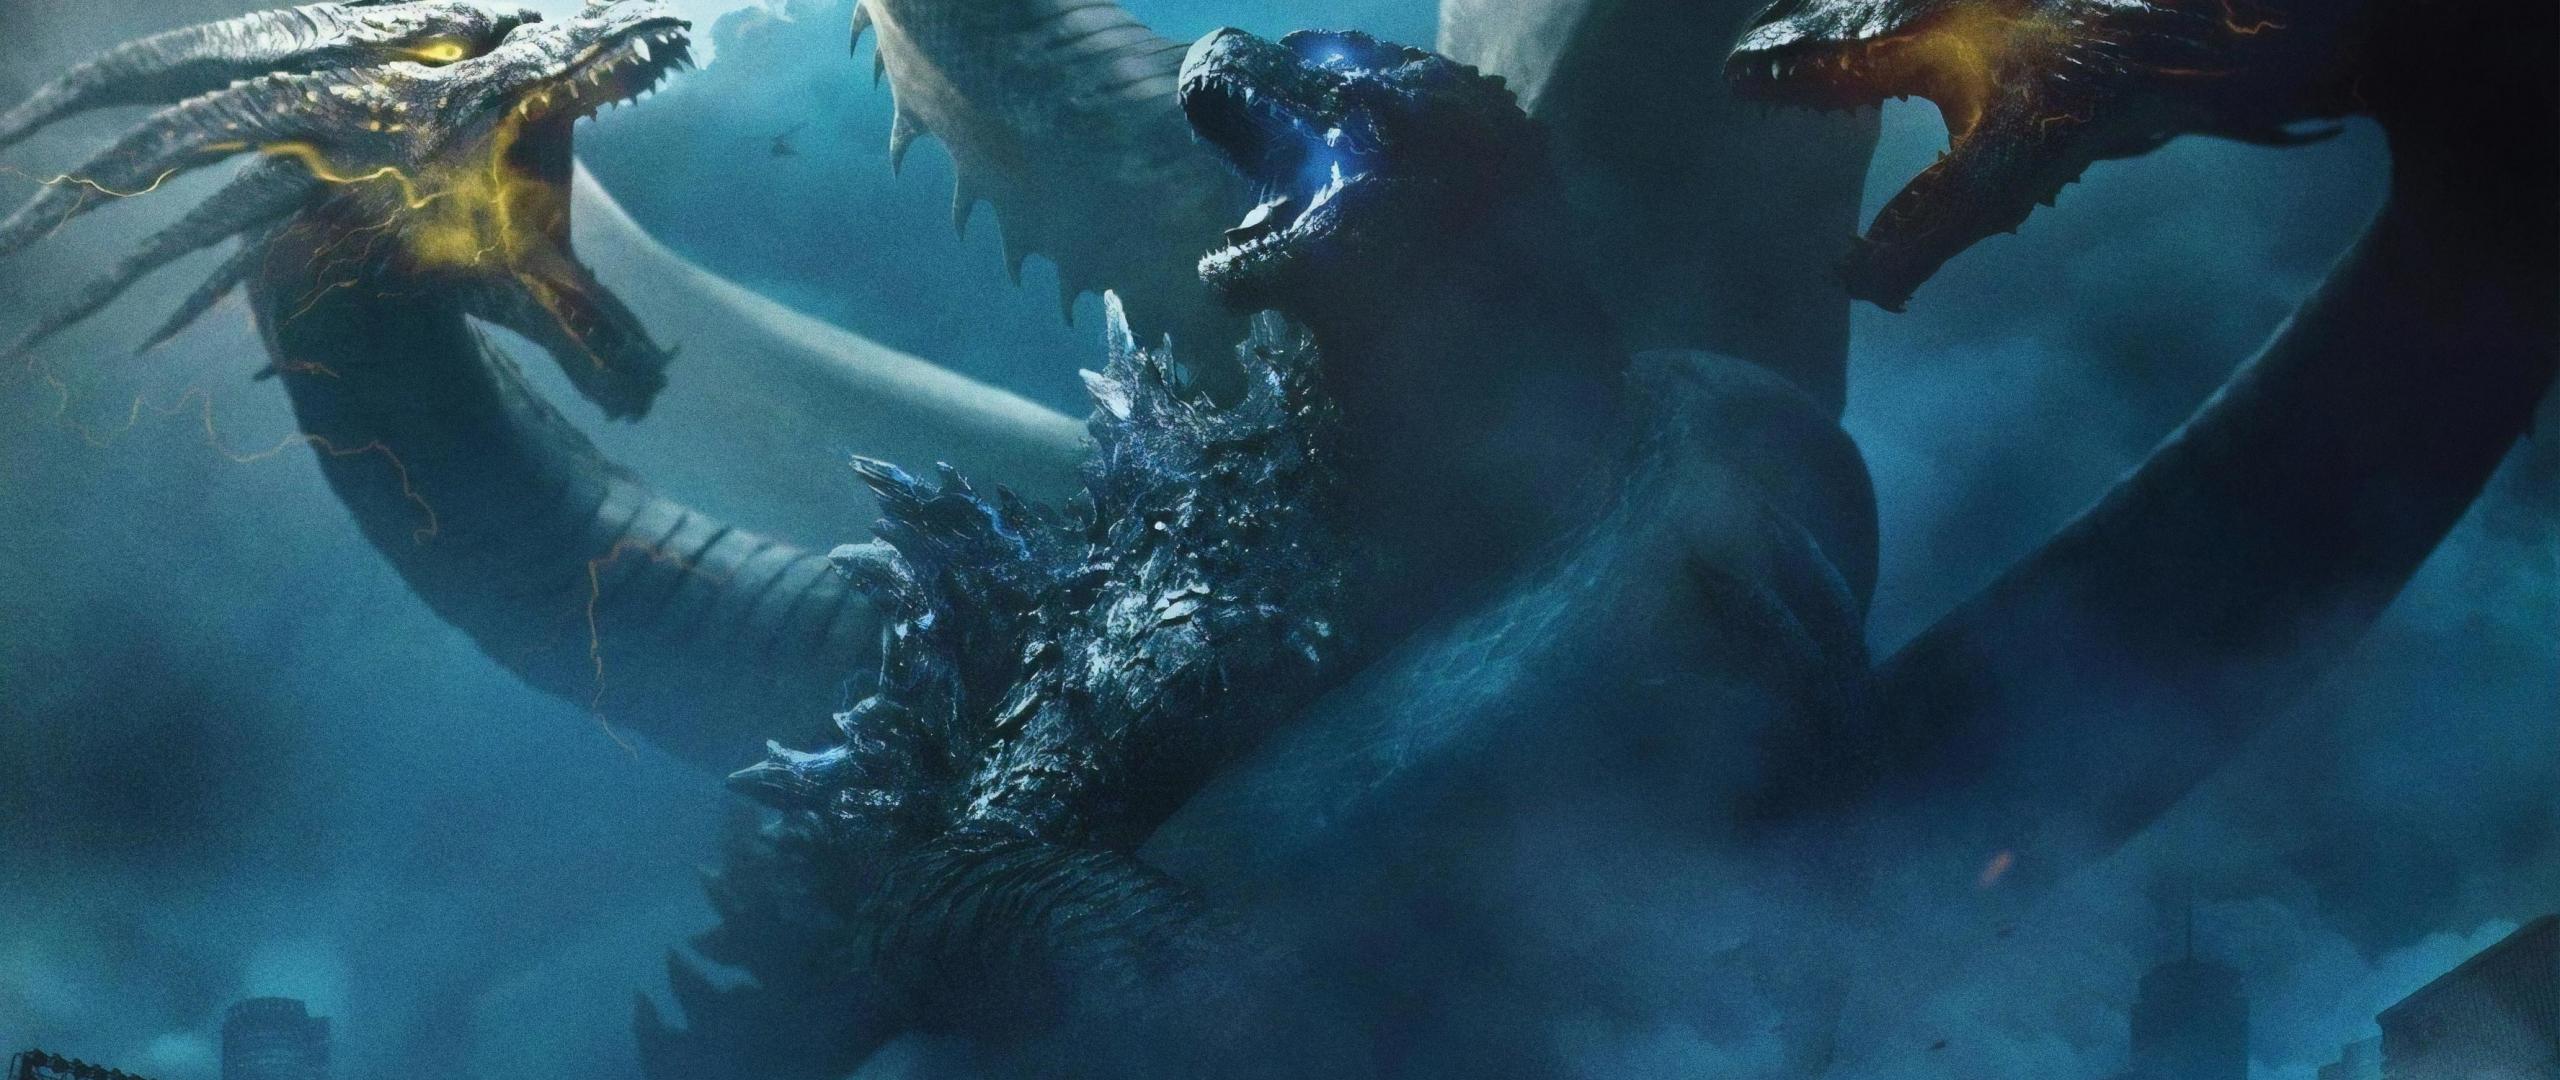 Download 2560x1080 Wallpaper 2019 Movie Godzilla King Of The